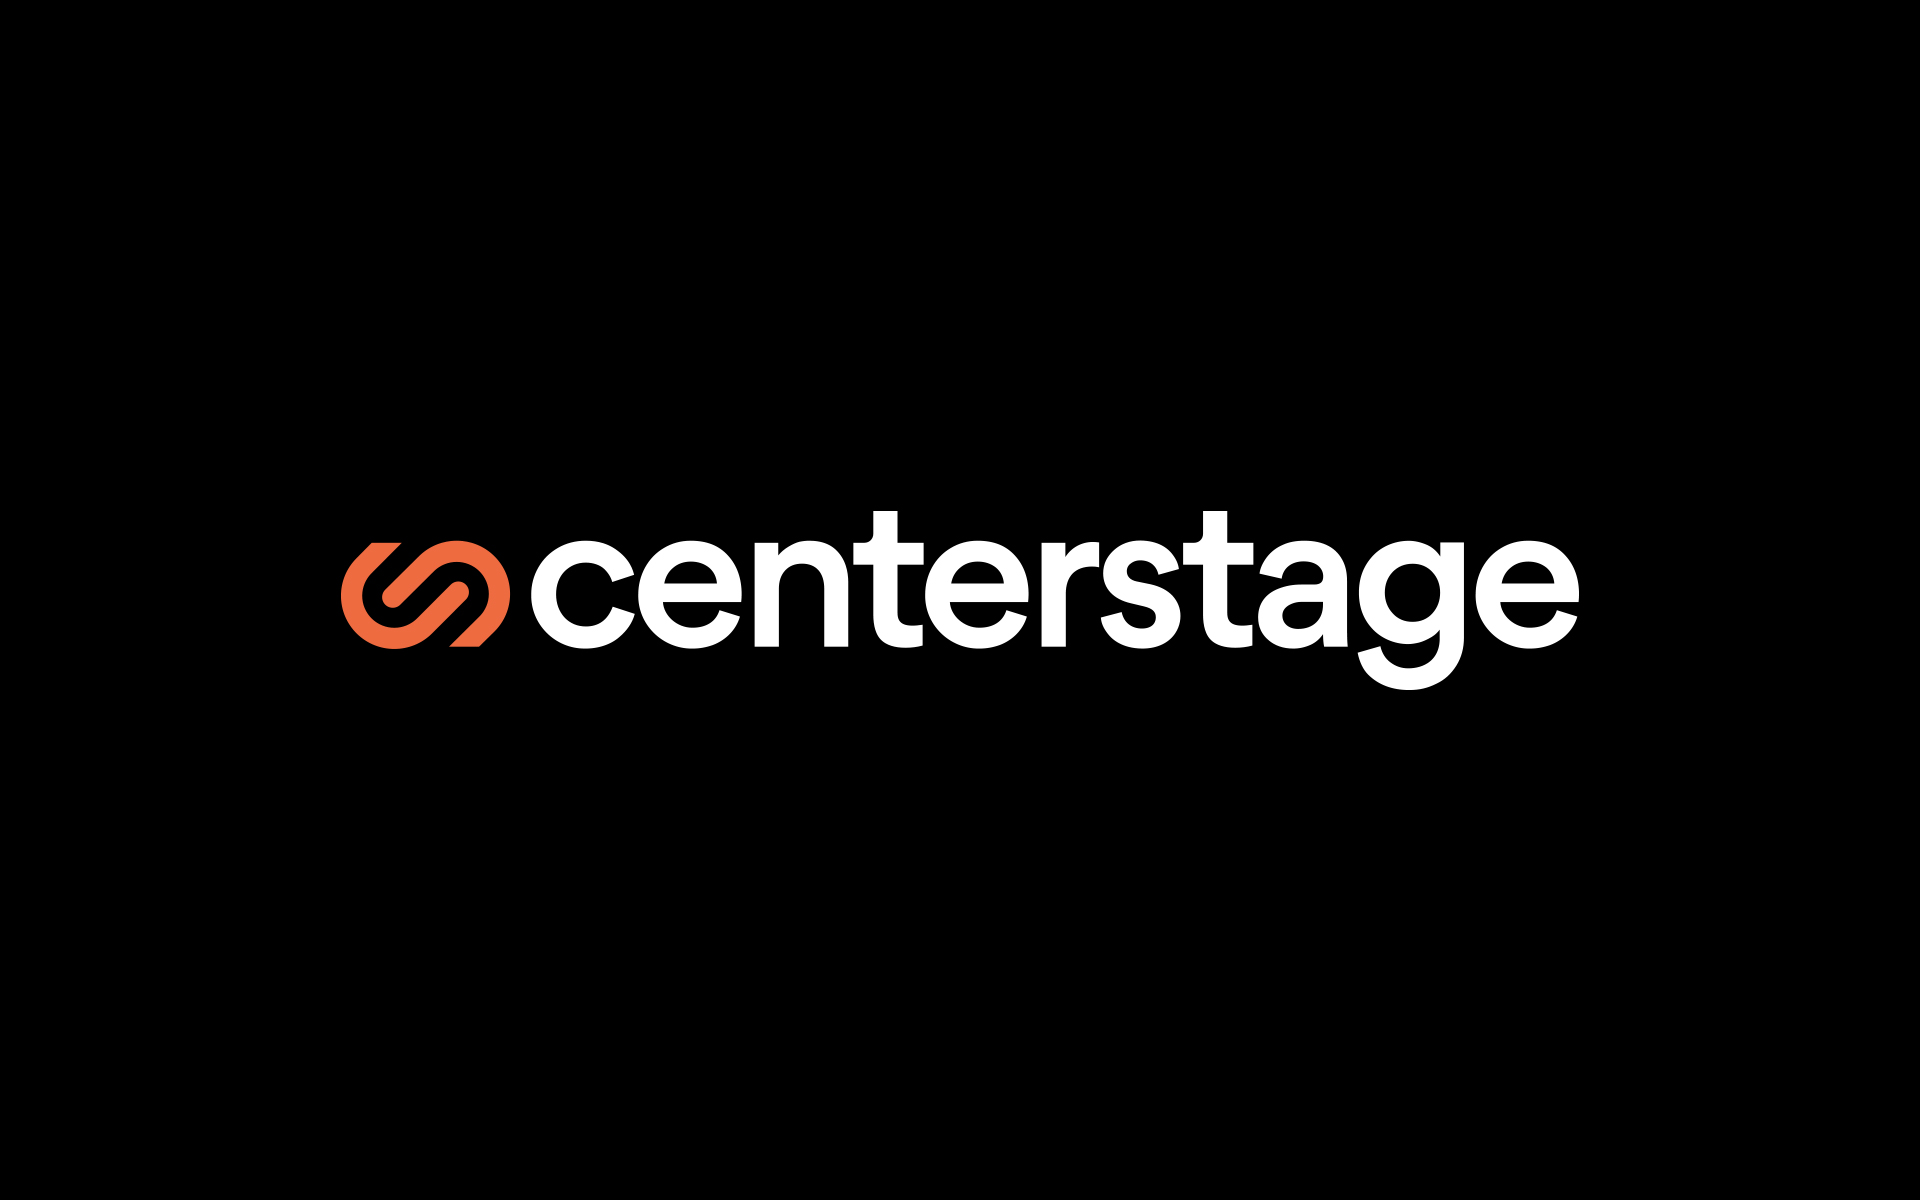 Centerstage logo on black